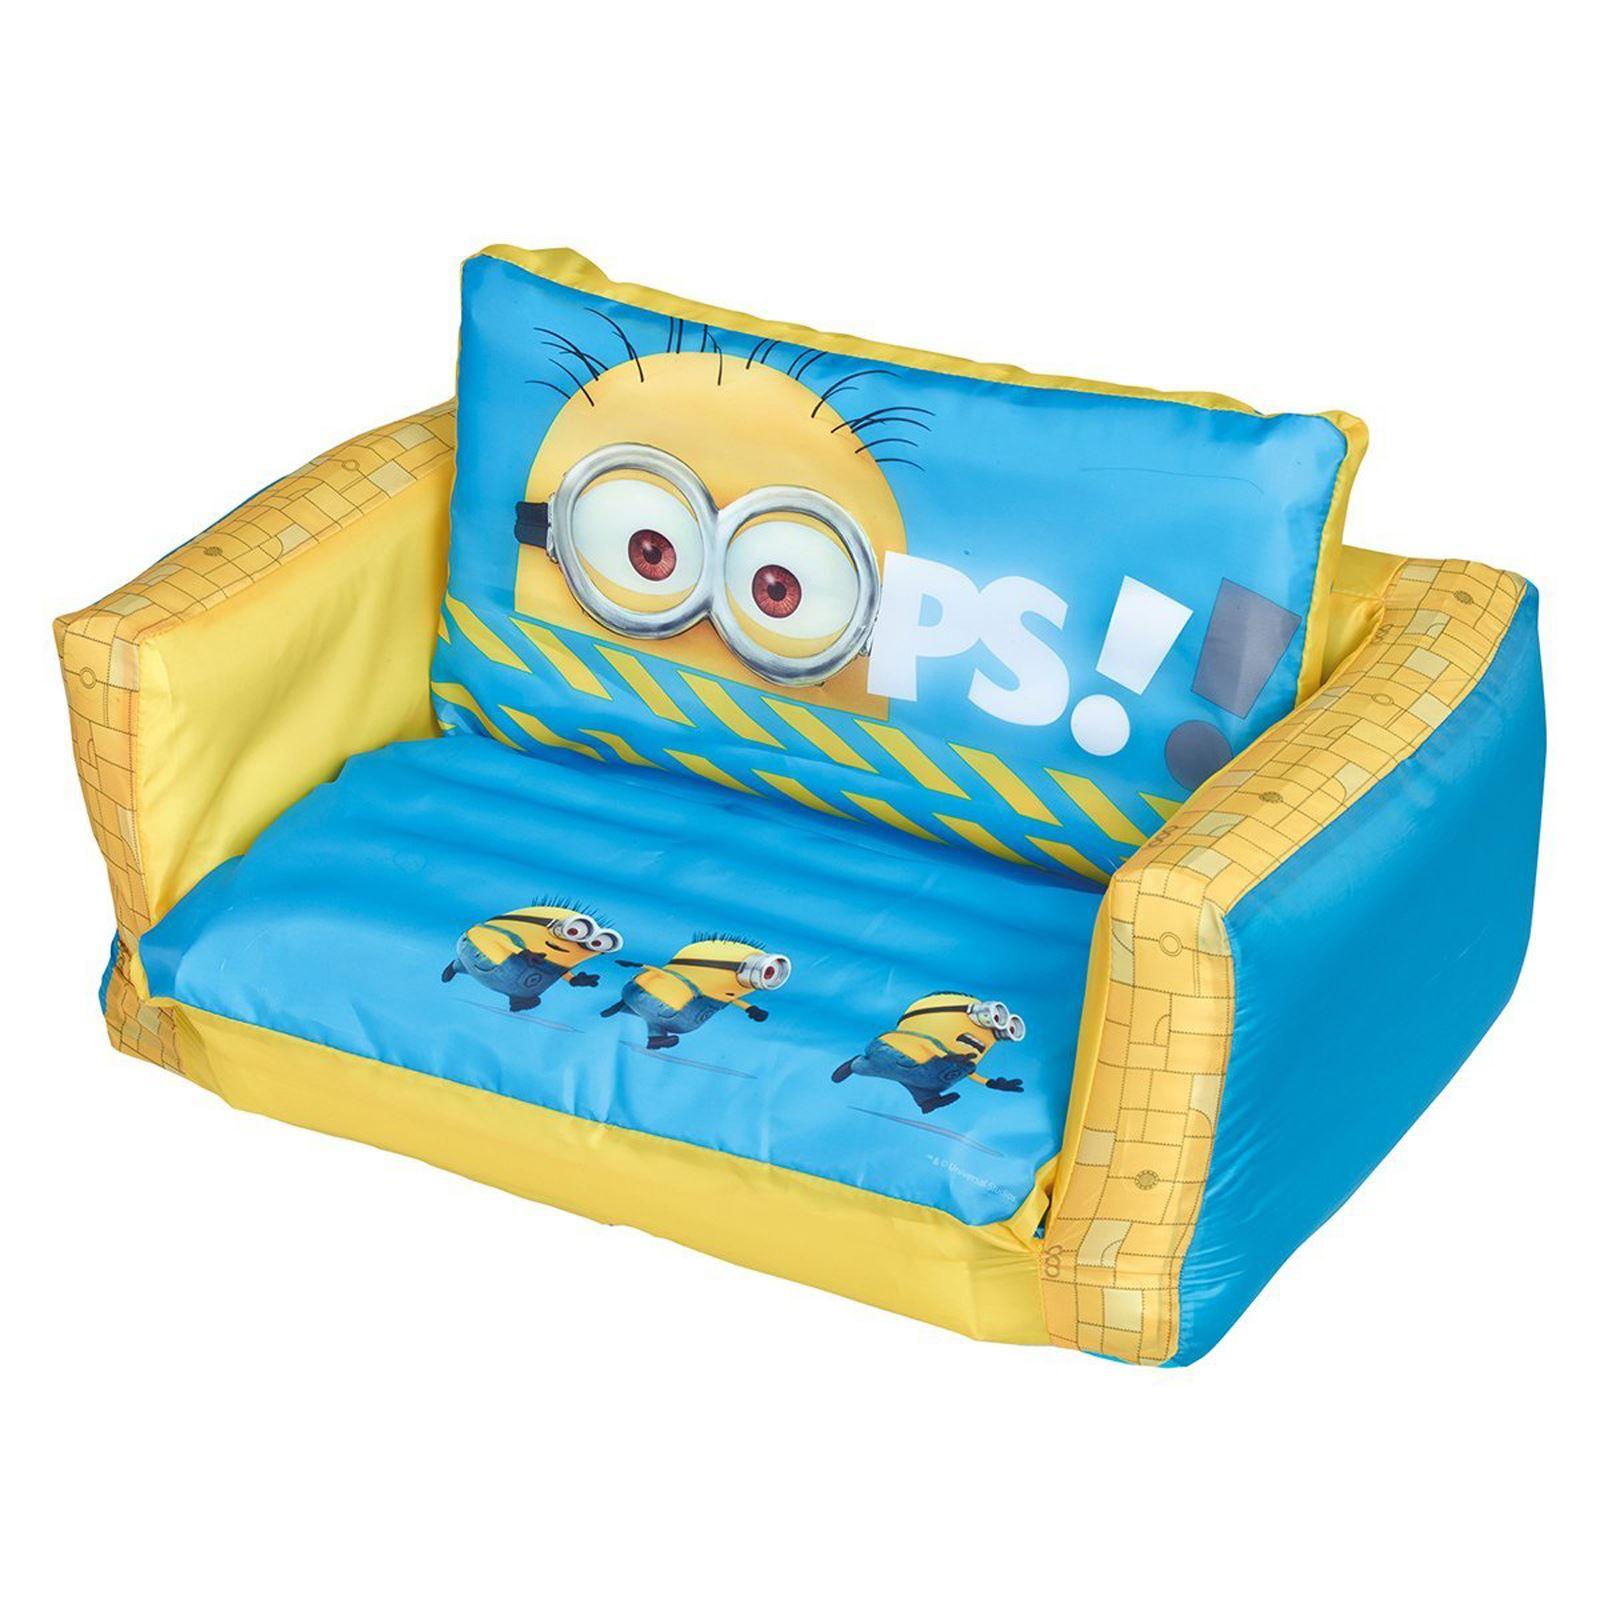 disney cars flip out sofa australia savoy leather costco range inflatable kids room new minions